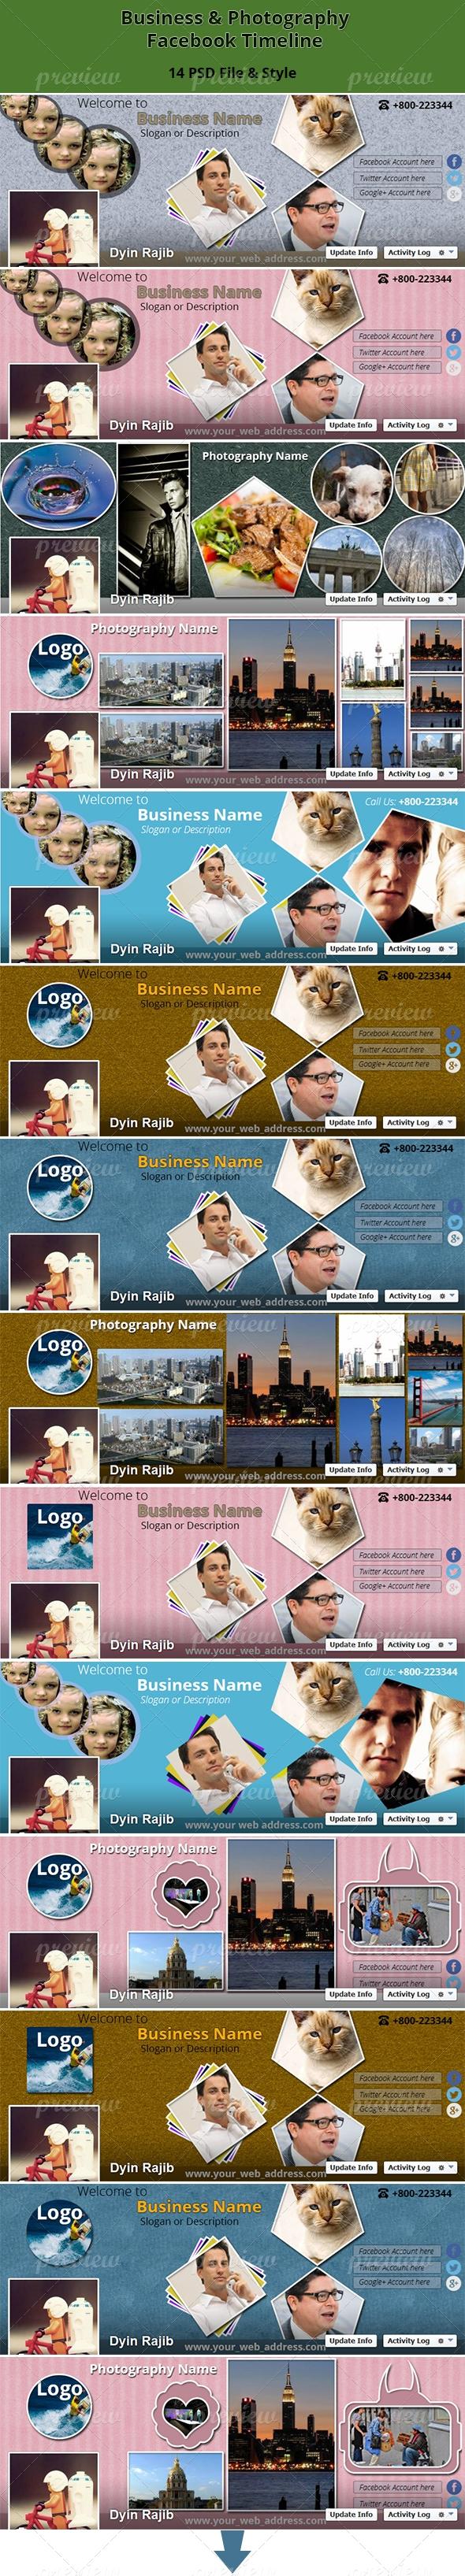 Business & Photography Facebook Timeline